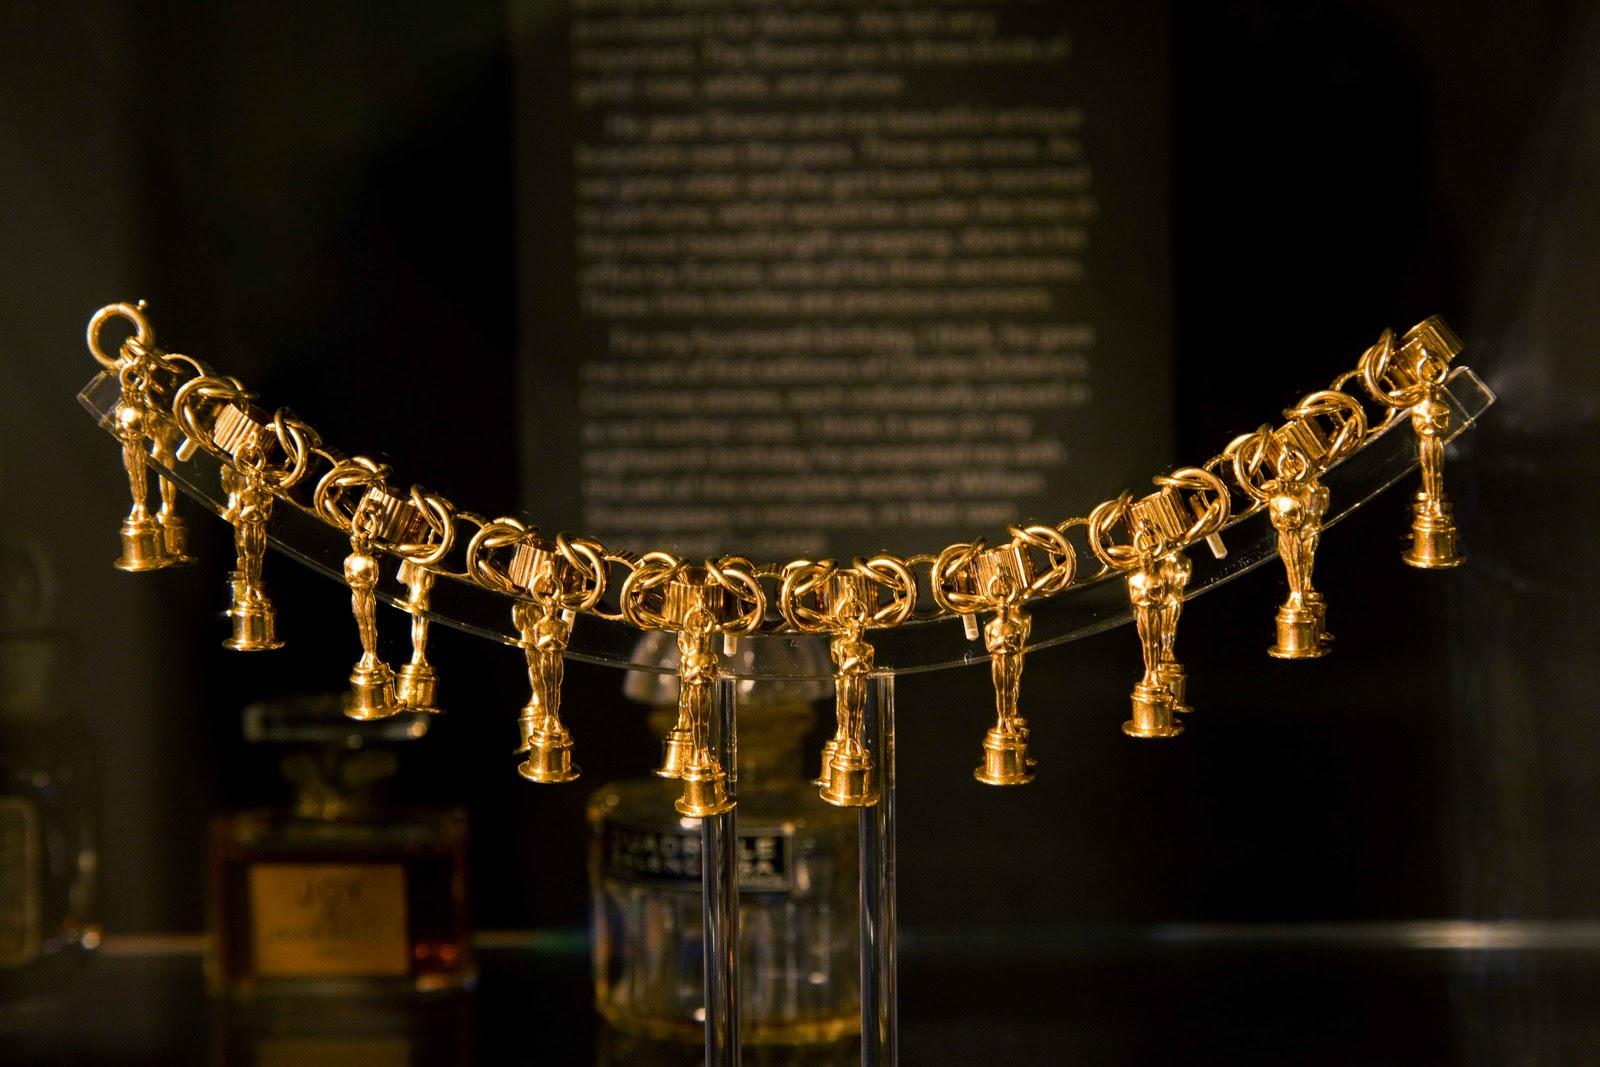 Lilly's Oscar Charm Bracelet